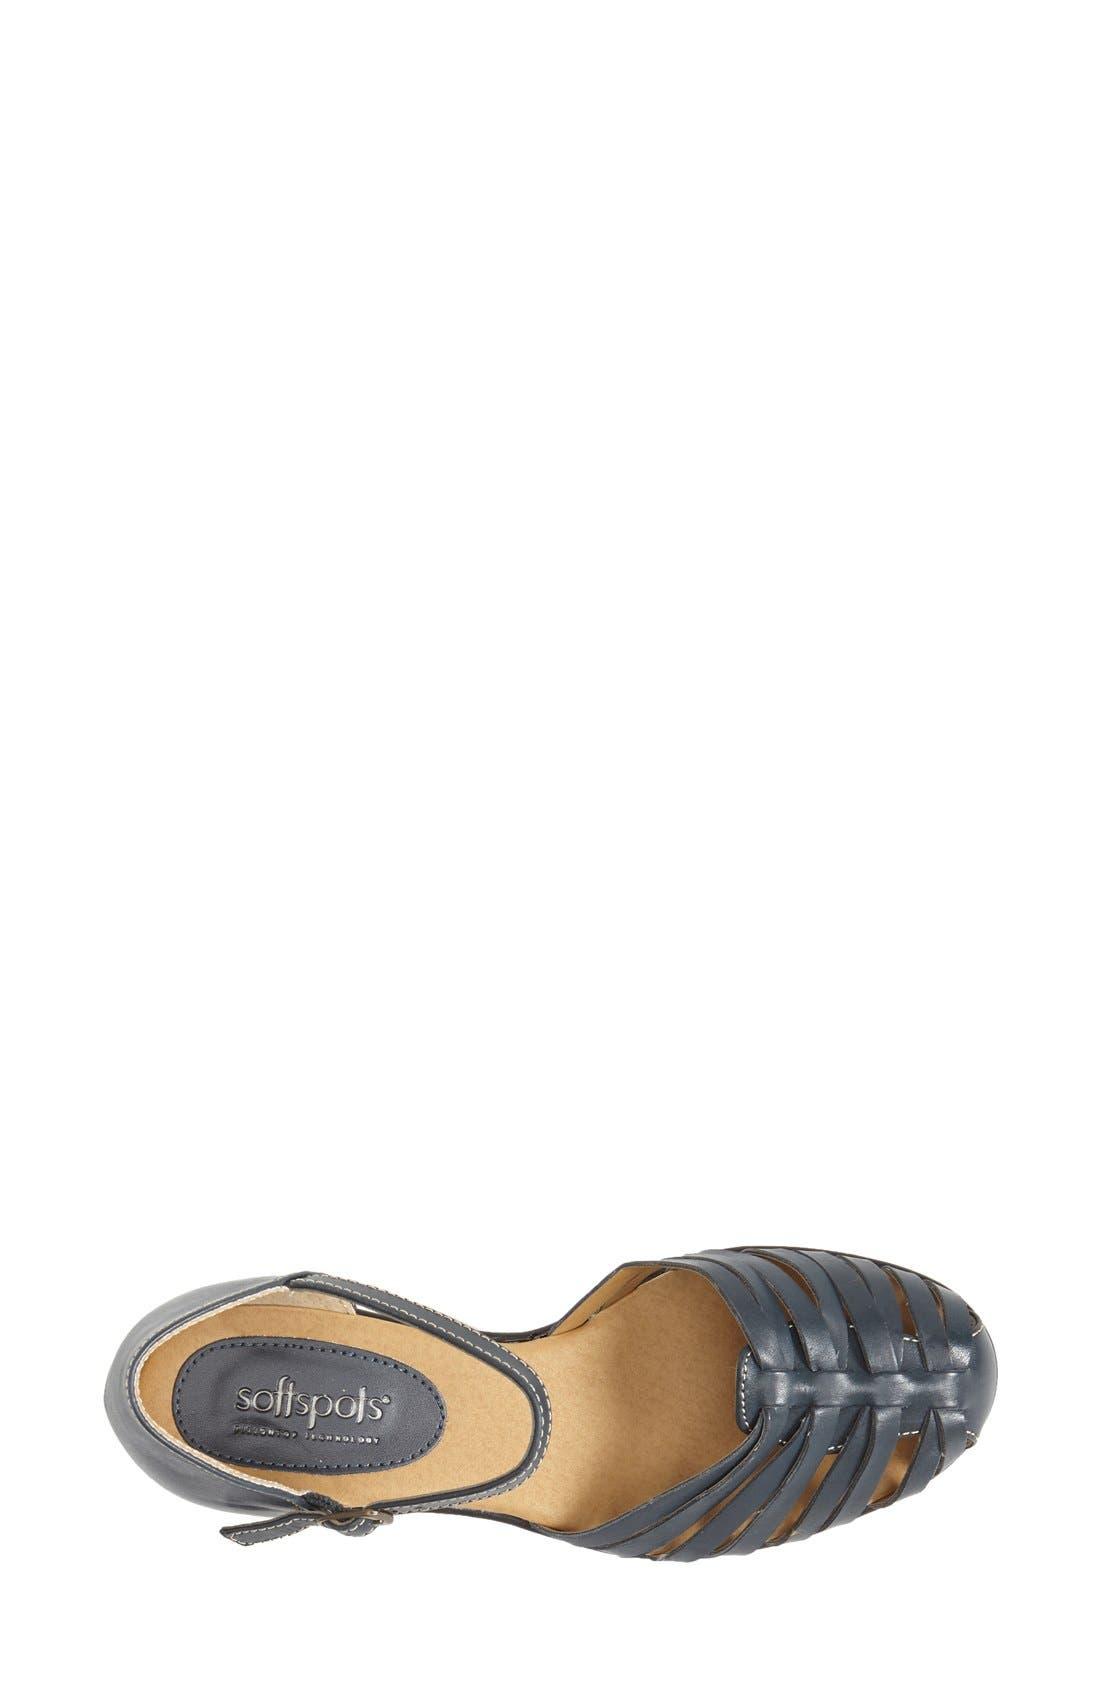 Alternate Image 3  - Softspots 'Tatianna' Sandal